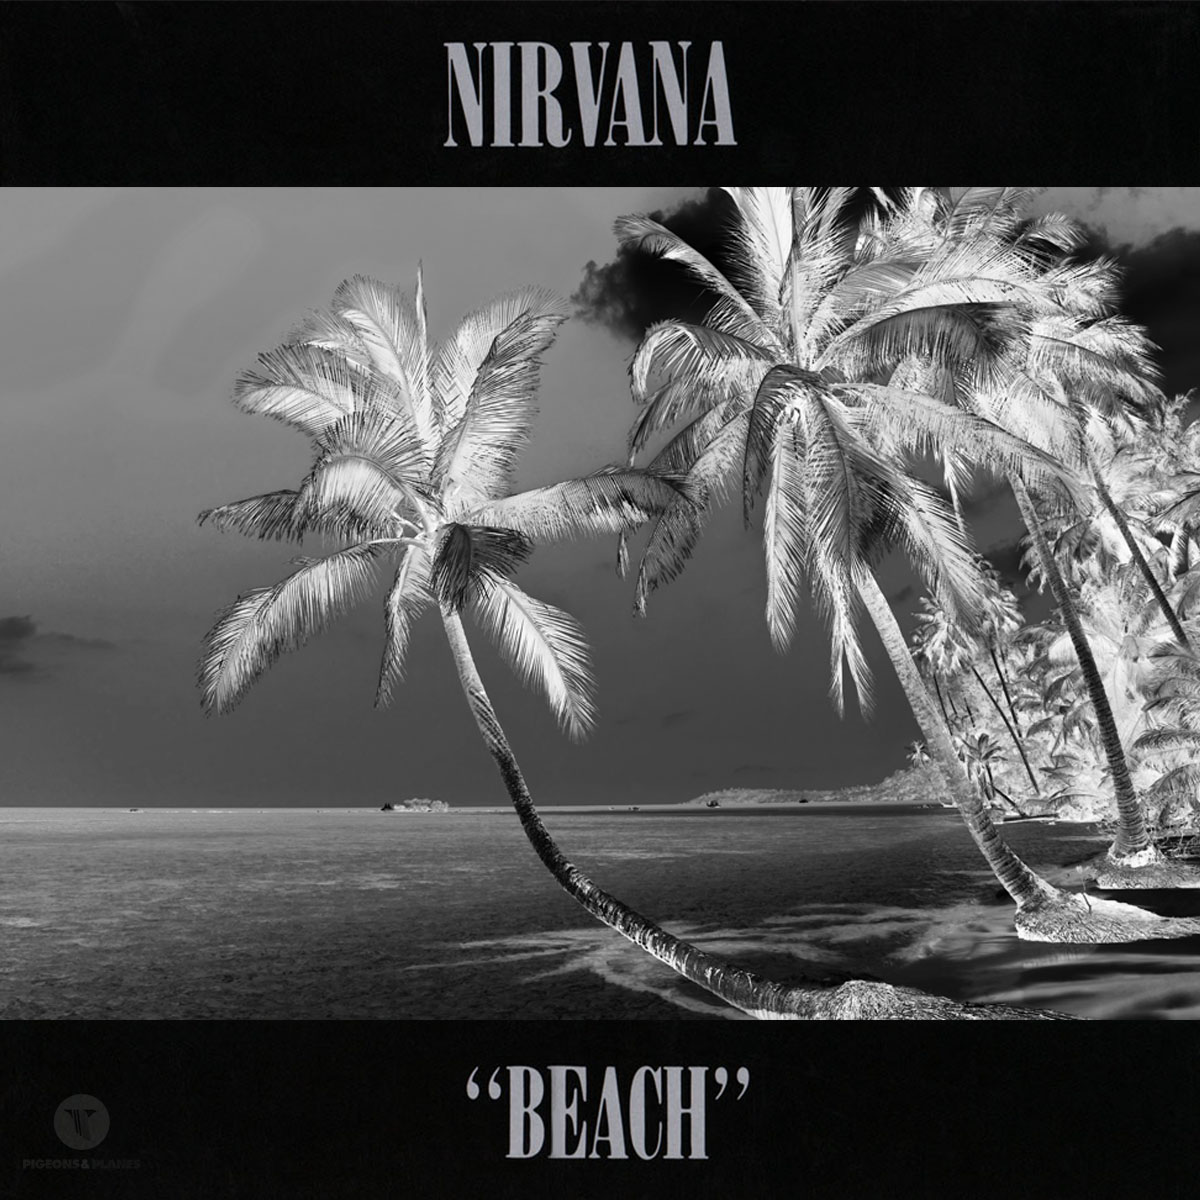 Nirvana beach album pigeon and planes